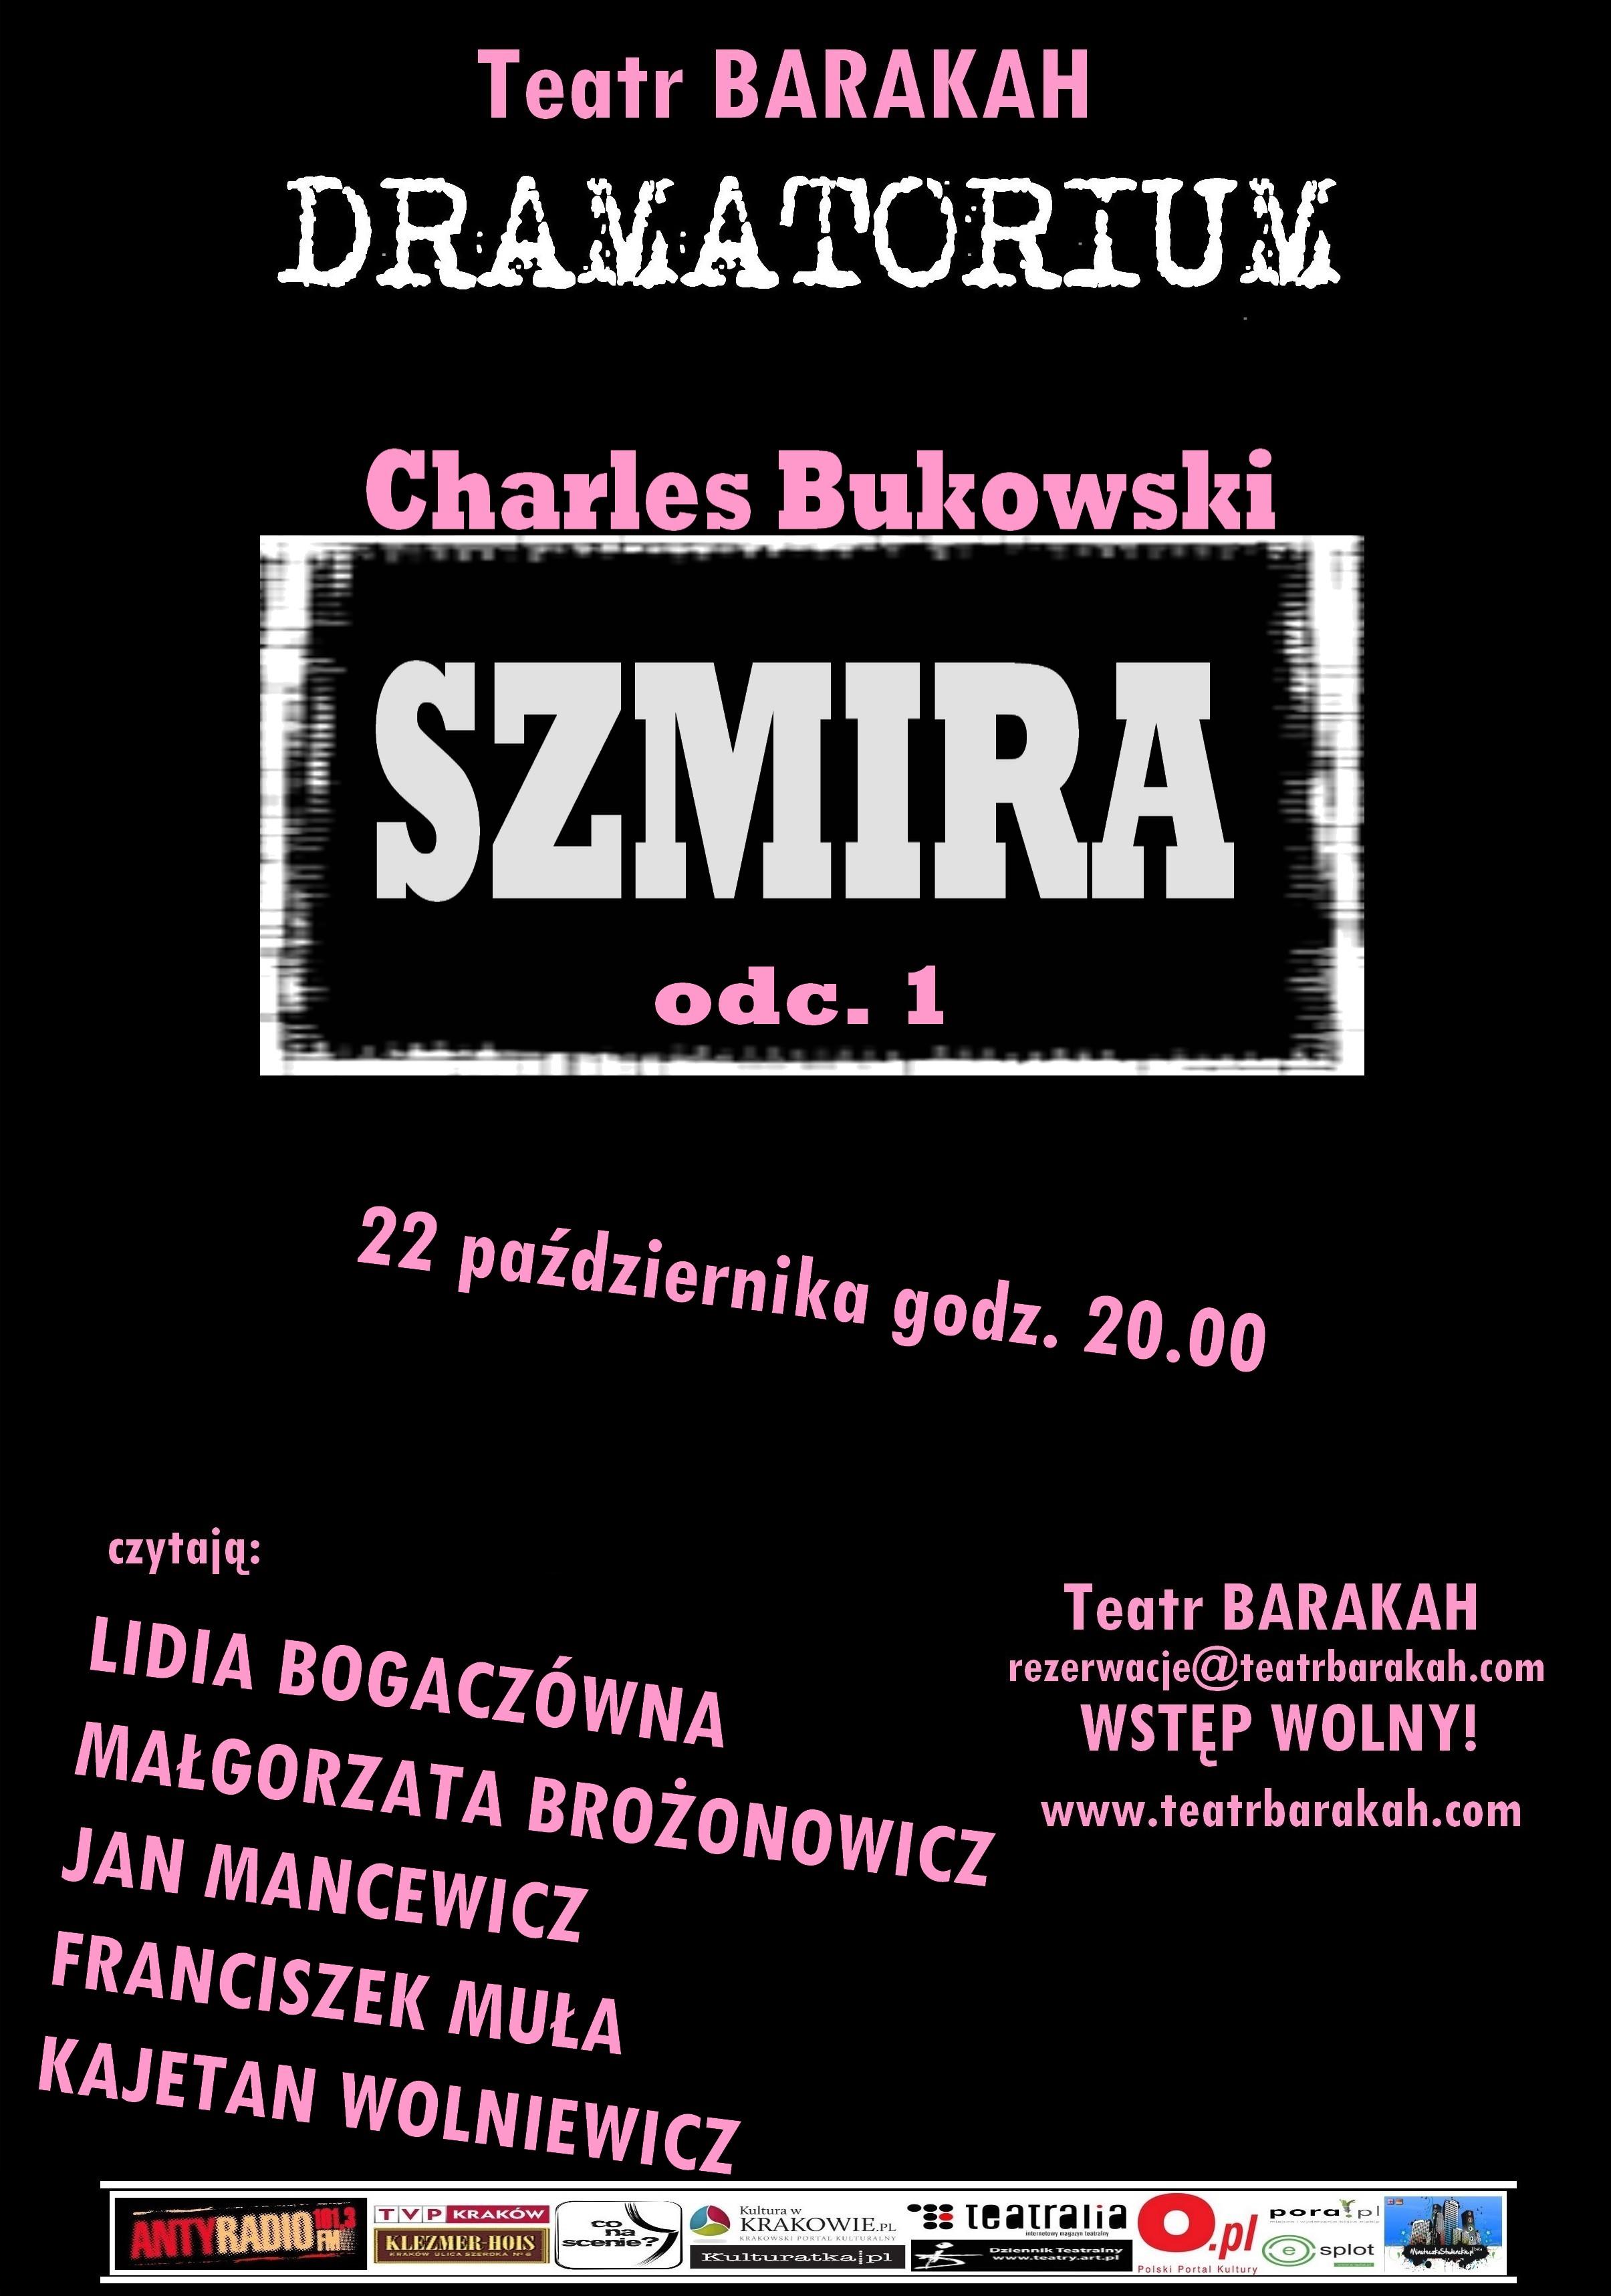 Dramatorium: Charles Bukowski, plakat (źródło: materiały prasowe organizatora)